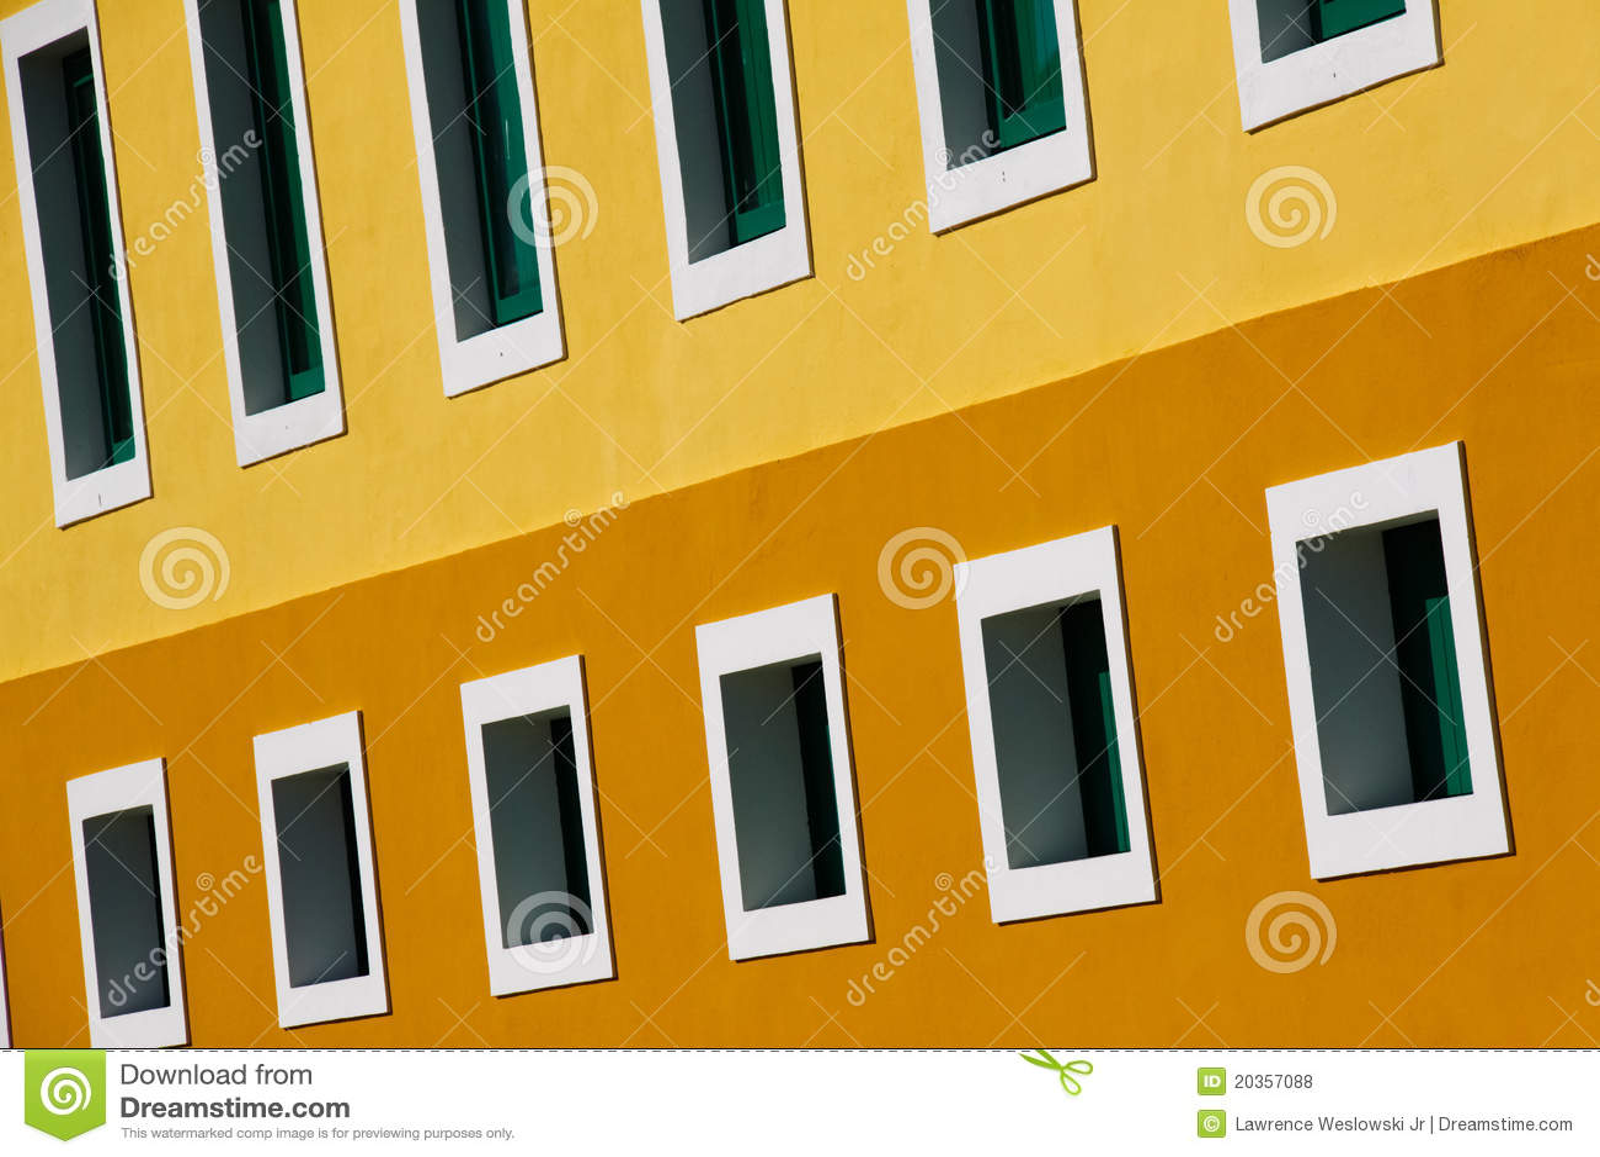 San Juan - Repeating Squares, Angles, Lines